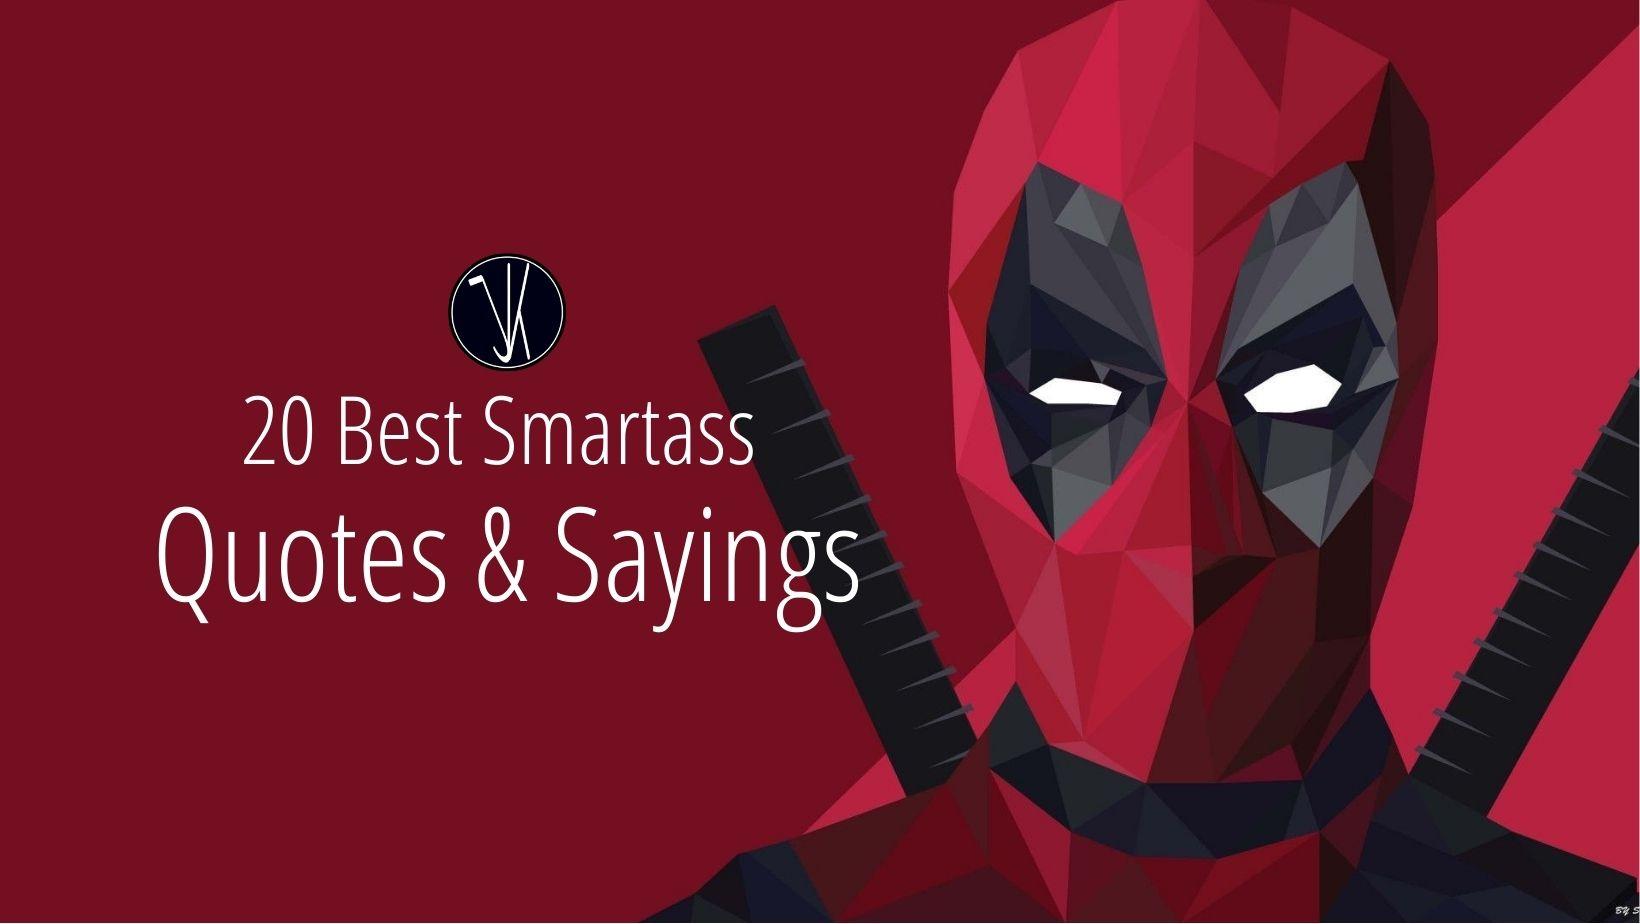 Smartass Quotes